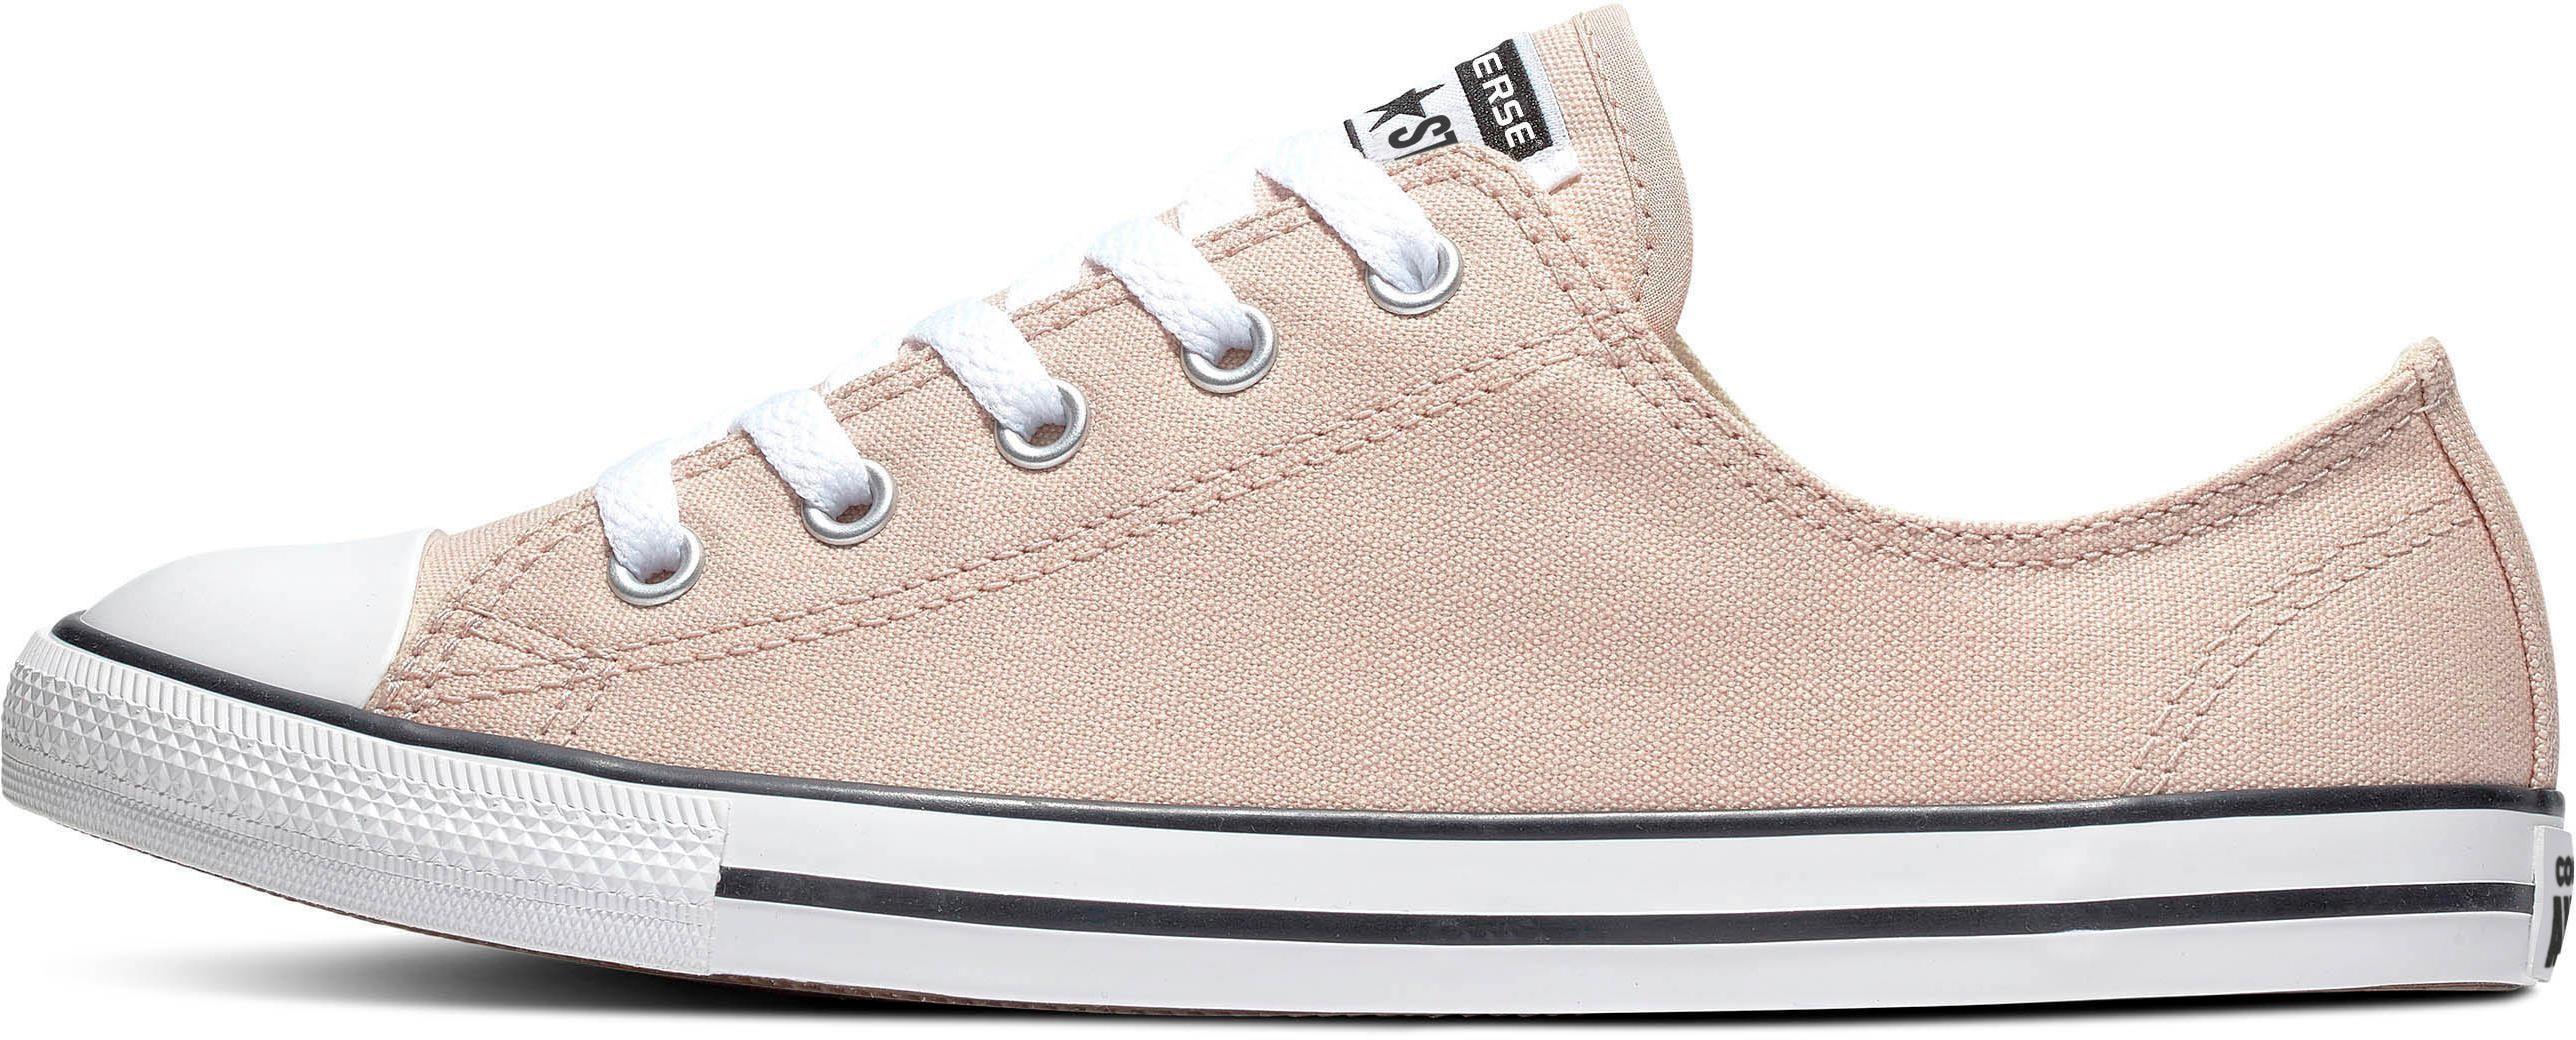 converse -  Sneaker Chuck Taylor All Star Dainty Ox Seasonal